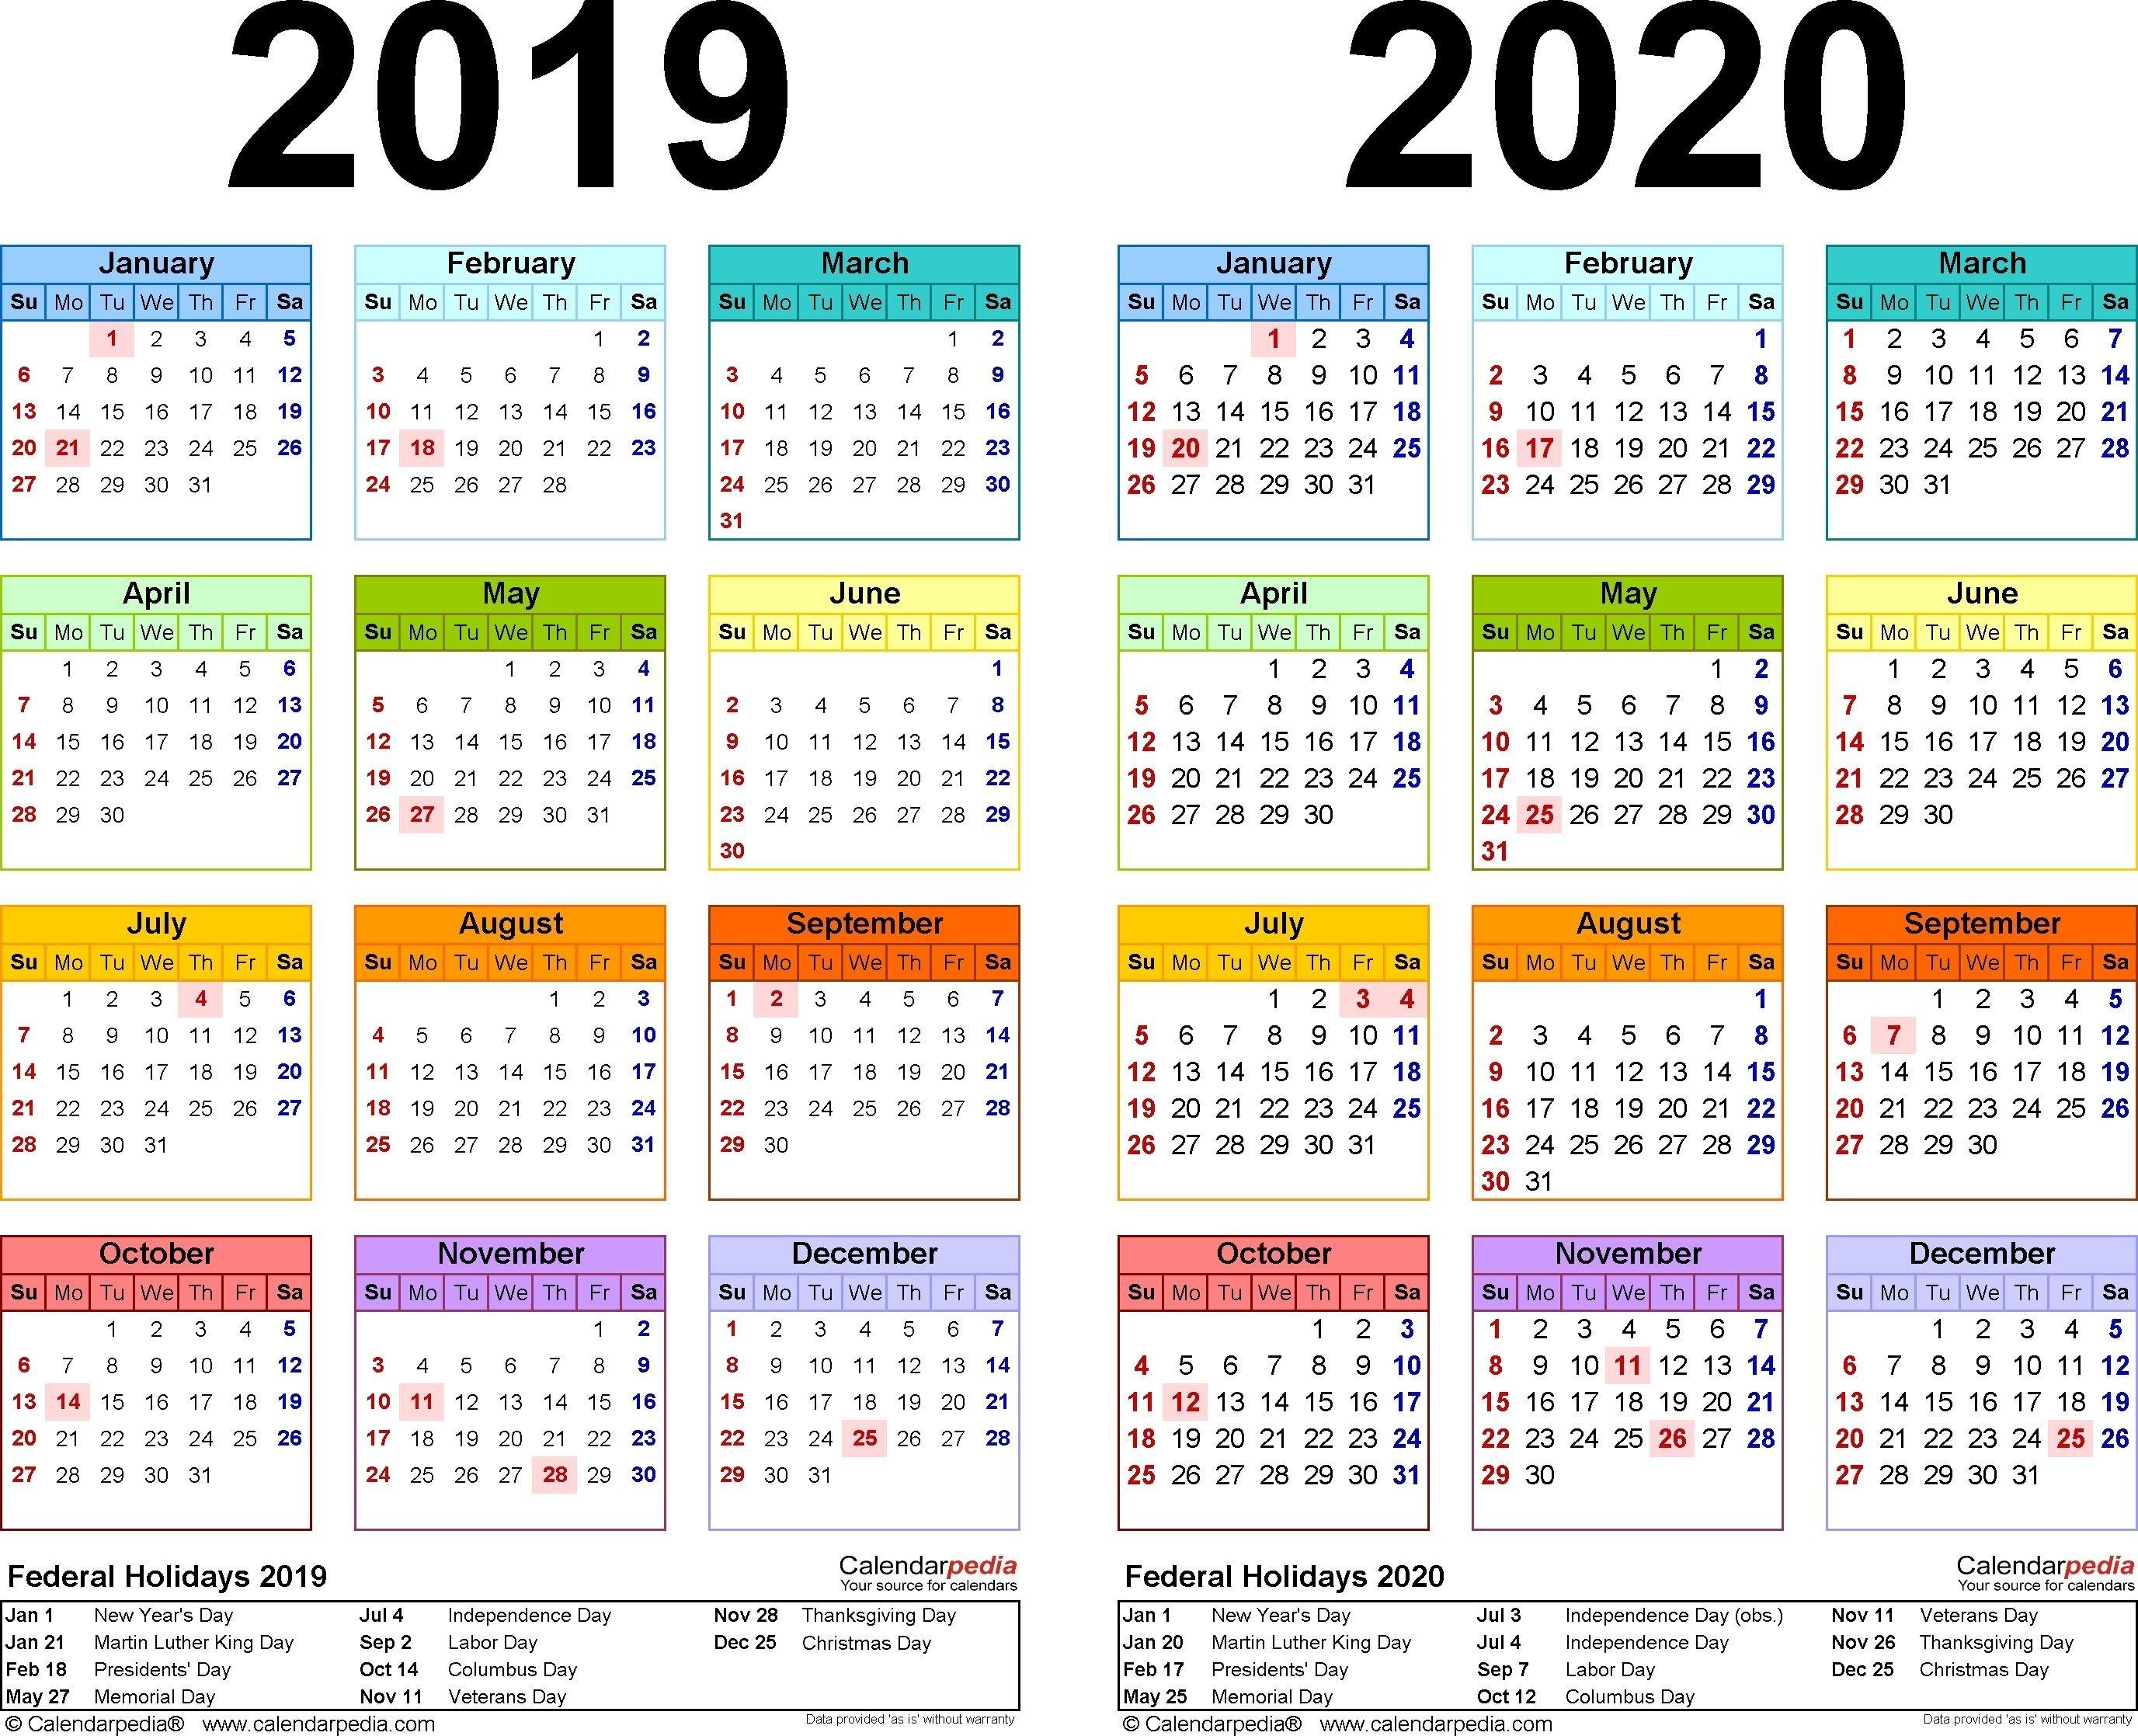 2019-2020 Calendar - Free Printable Two-Year Excel Calendars-Bill Calendar 2020 Templates